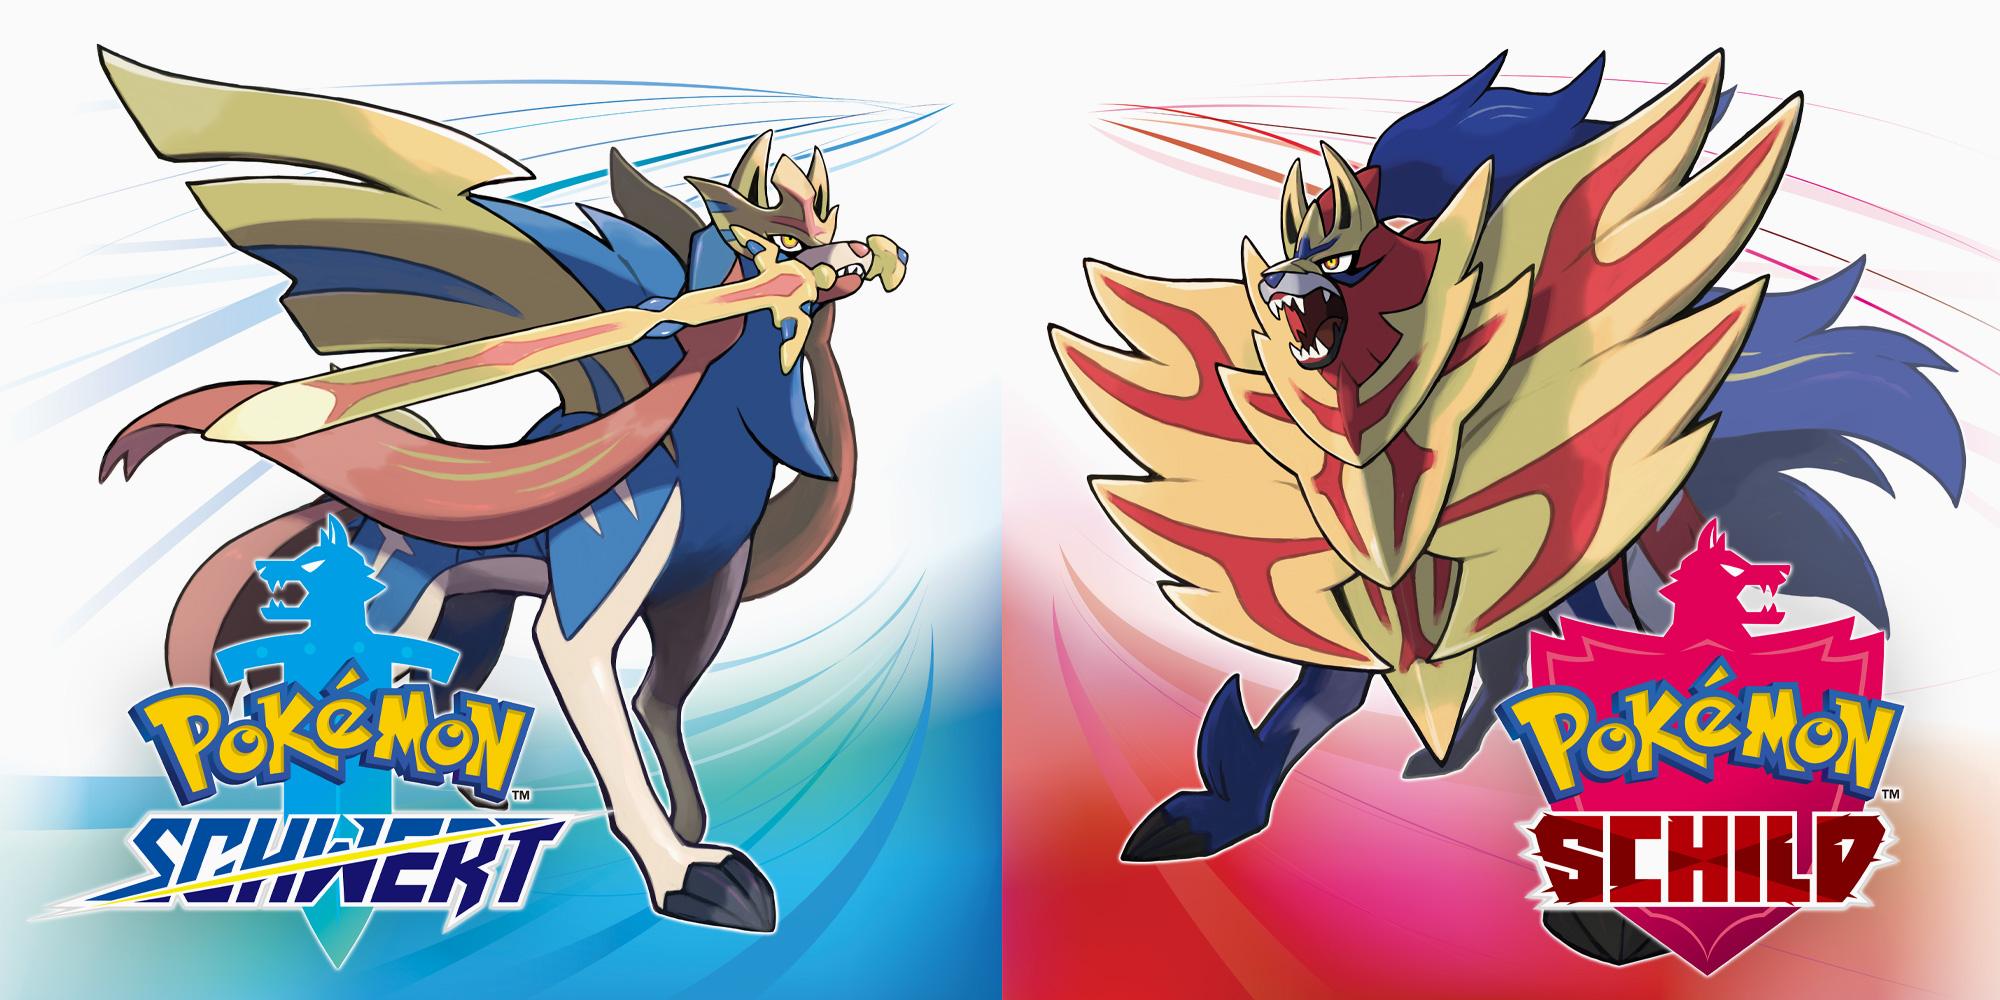 H2x1_NSwitch_PokemonSwordPokemonShield_Combo_deDE-1.jpg